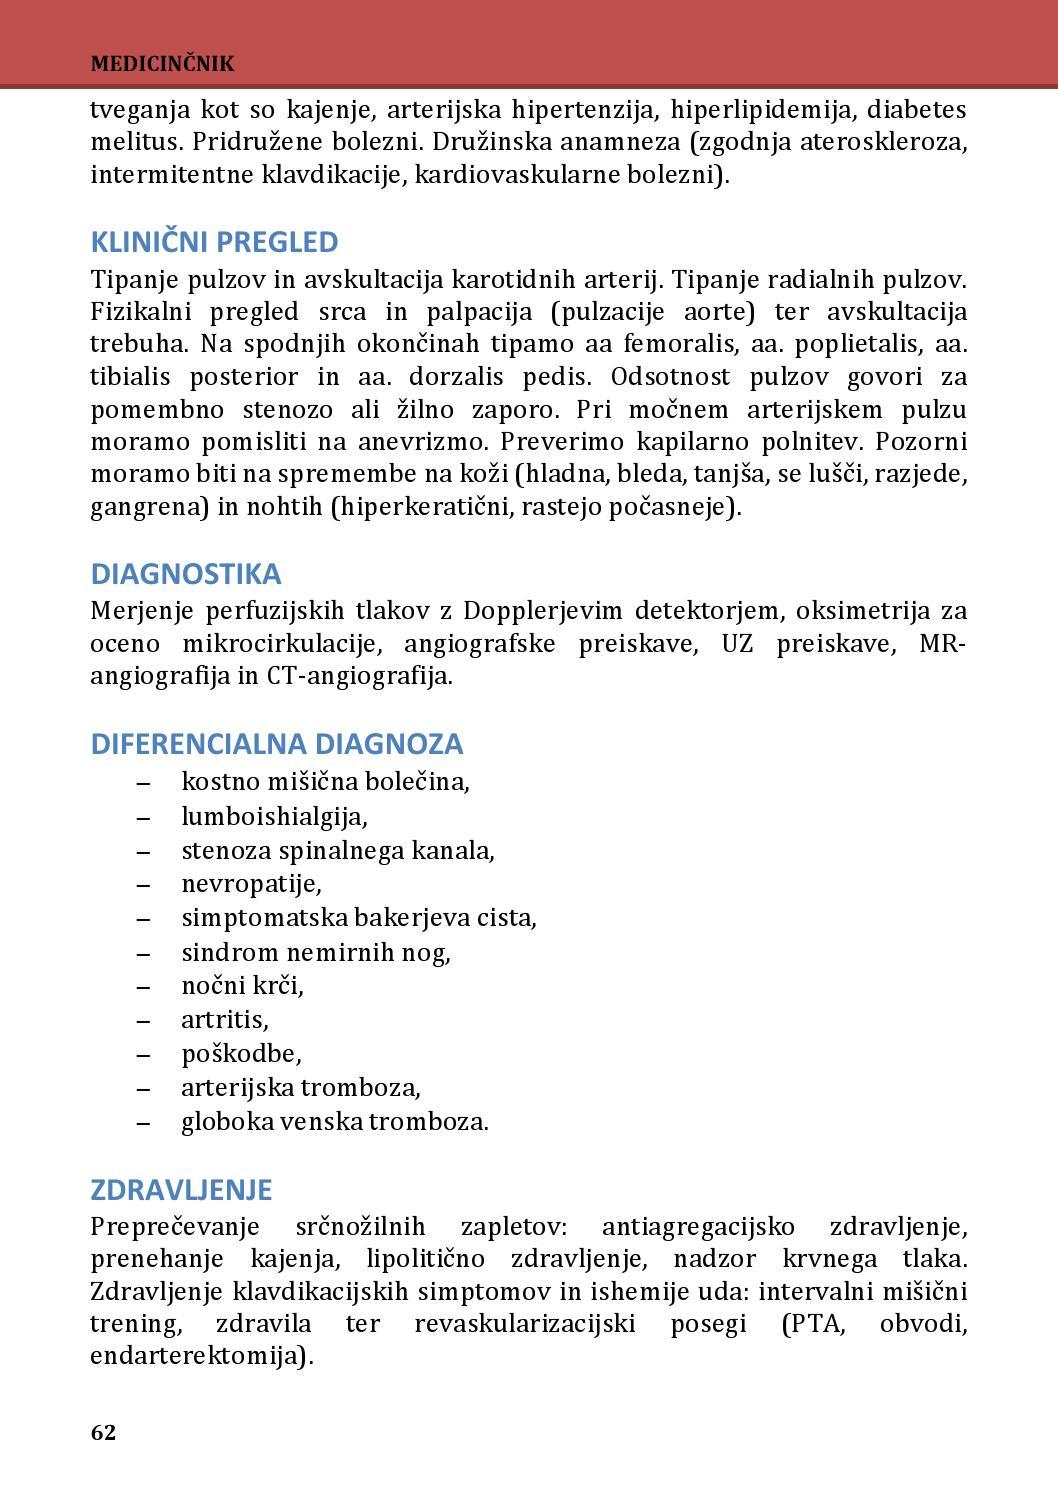 hipertenzija hiperlipidemija